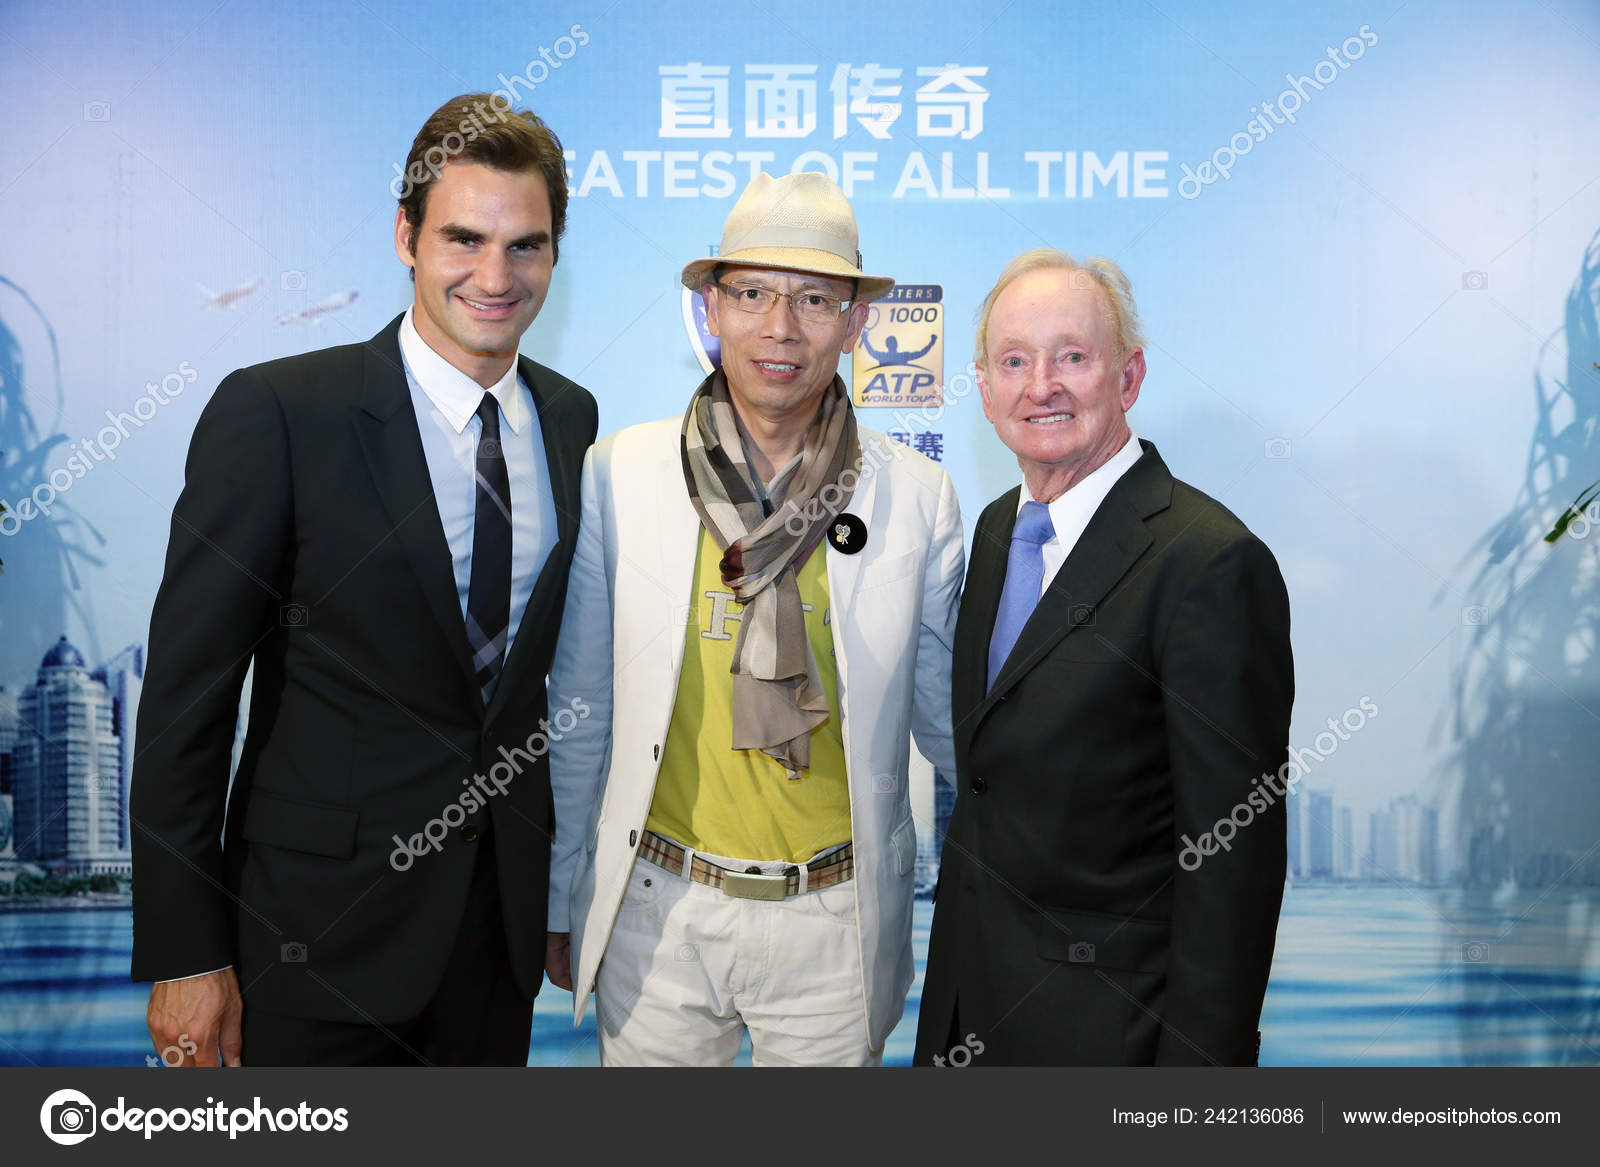 7aa4baa5ab64 Roger Federer Suiza Izquierda Posa Con Leyenda Australias Tenis Rod — Foto  de Stock